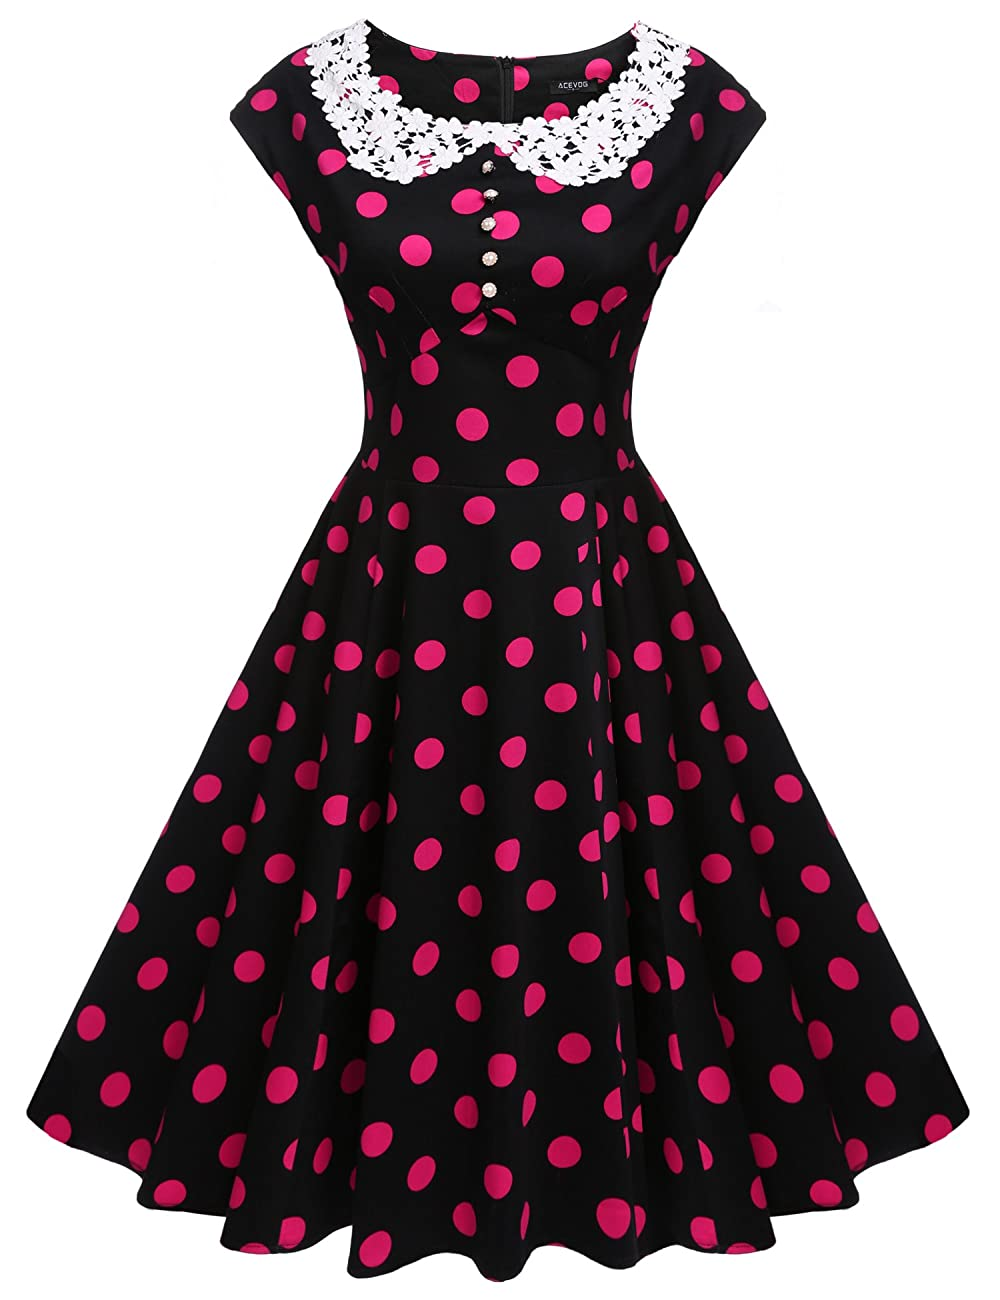 ACEVOG Women's Classy Vintage Audrey Hepburn Style 1940's Rockabilly Evening Dress 0